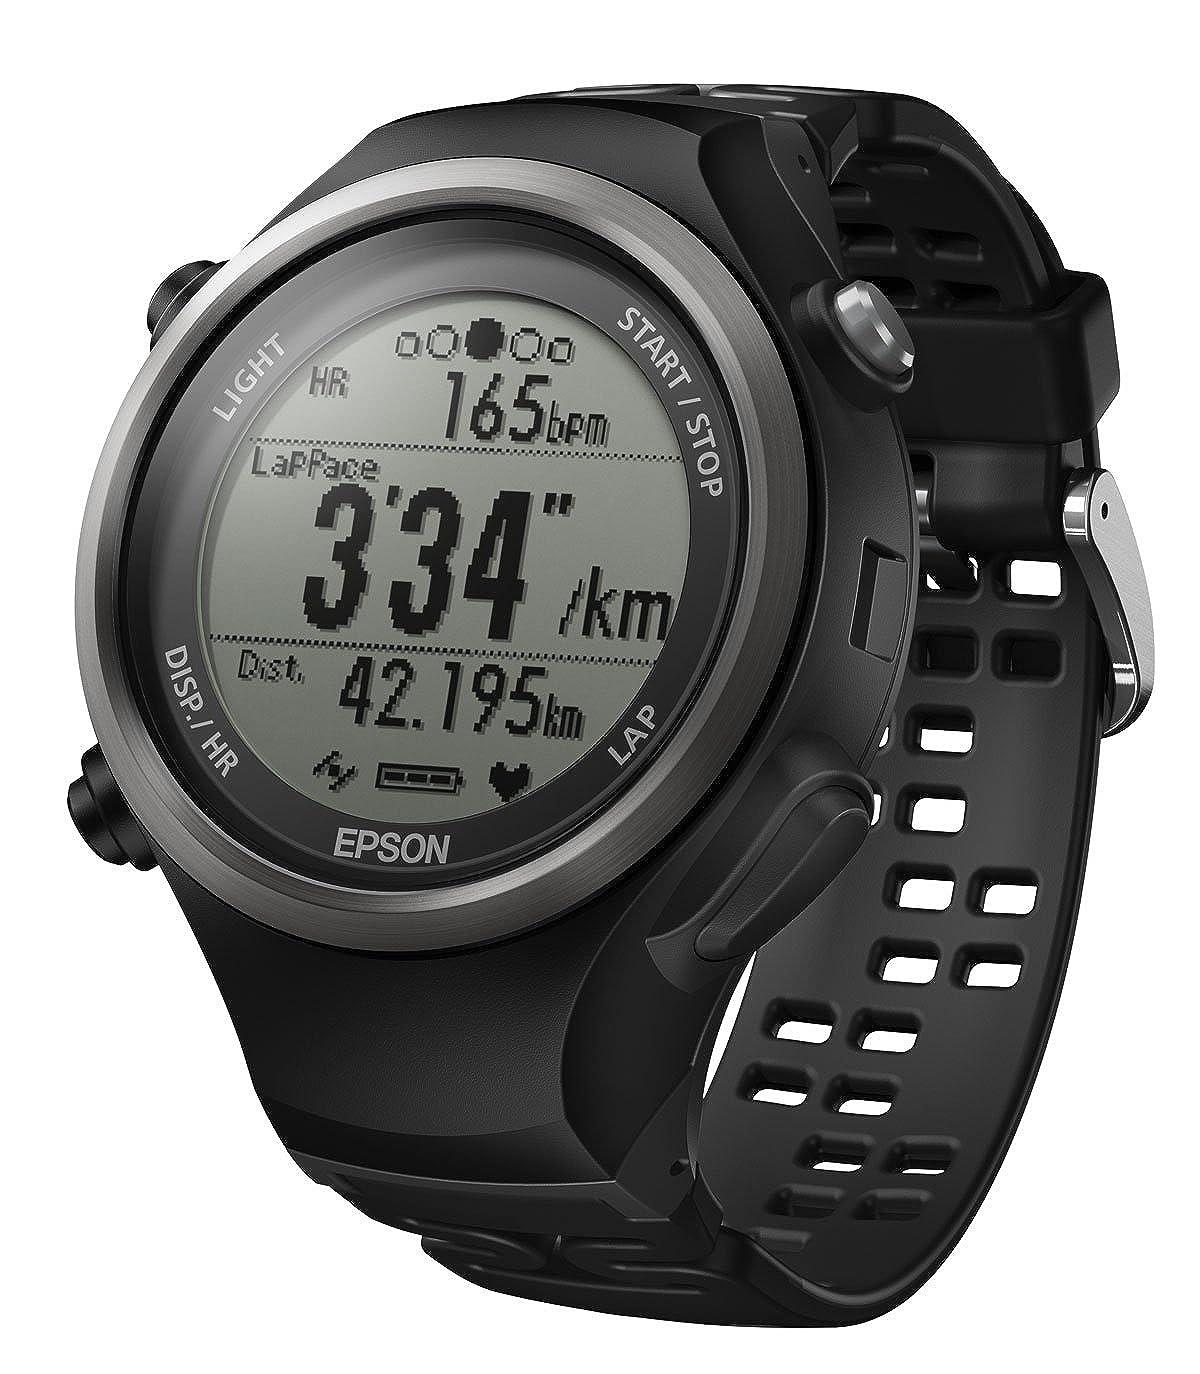 7c3d86b7db Amazon | [エプソン リスタブルジーピーエス]EPSON Wristable GPS 腕時計 GPS・脈拍計測機能付 SF-810B |  レディース腕時計 | 腕時計 通販